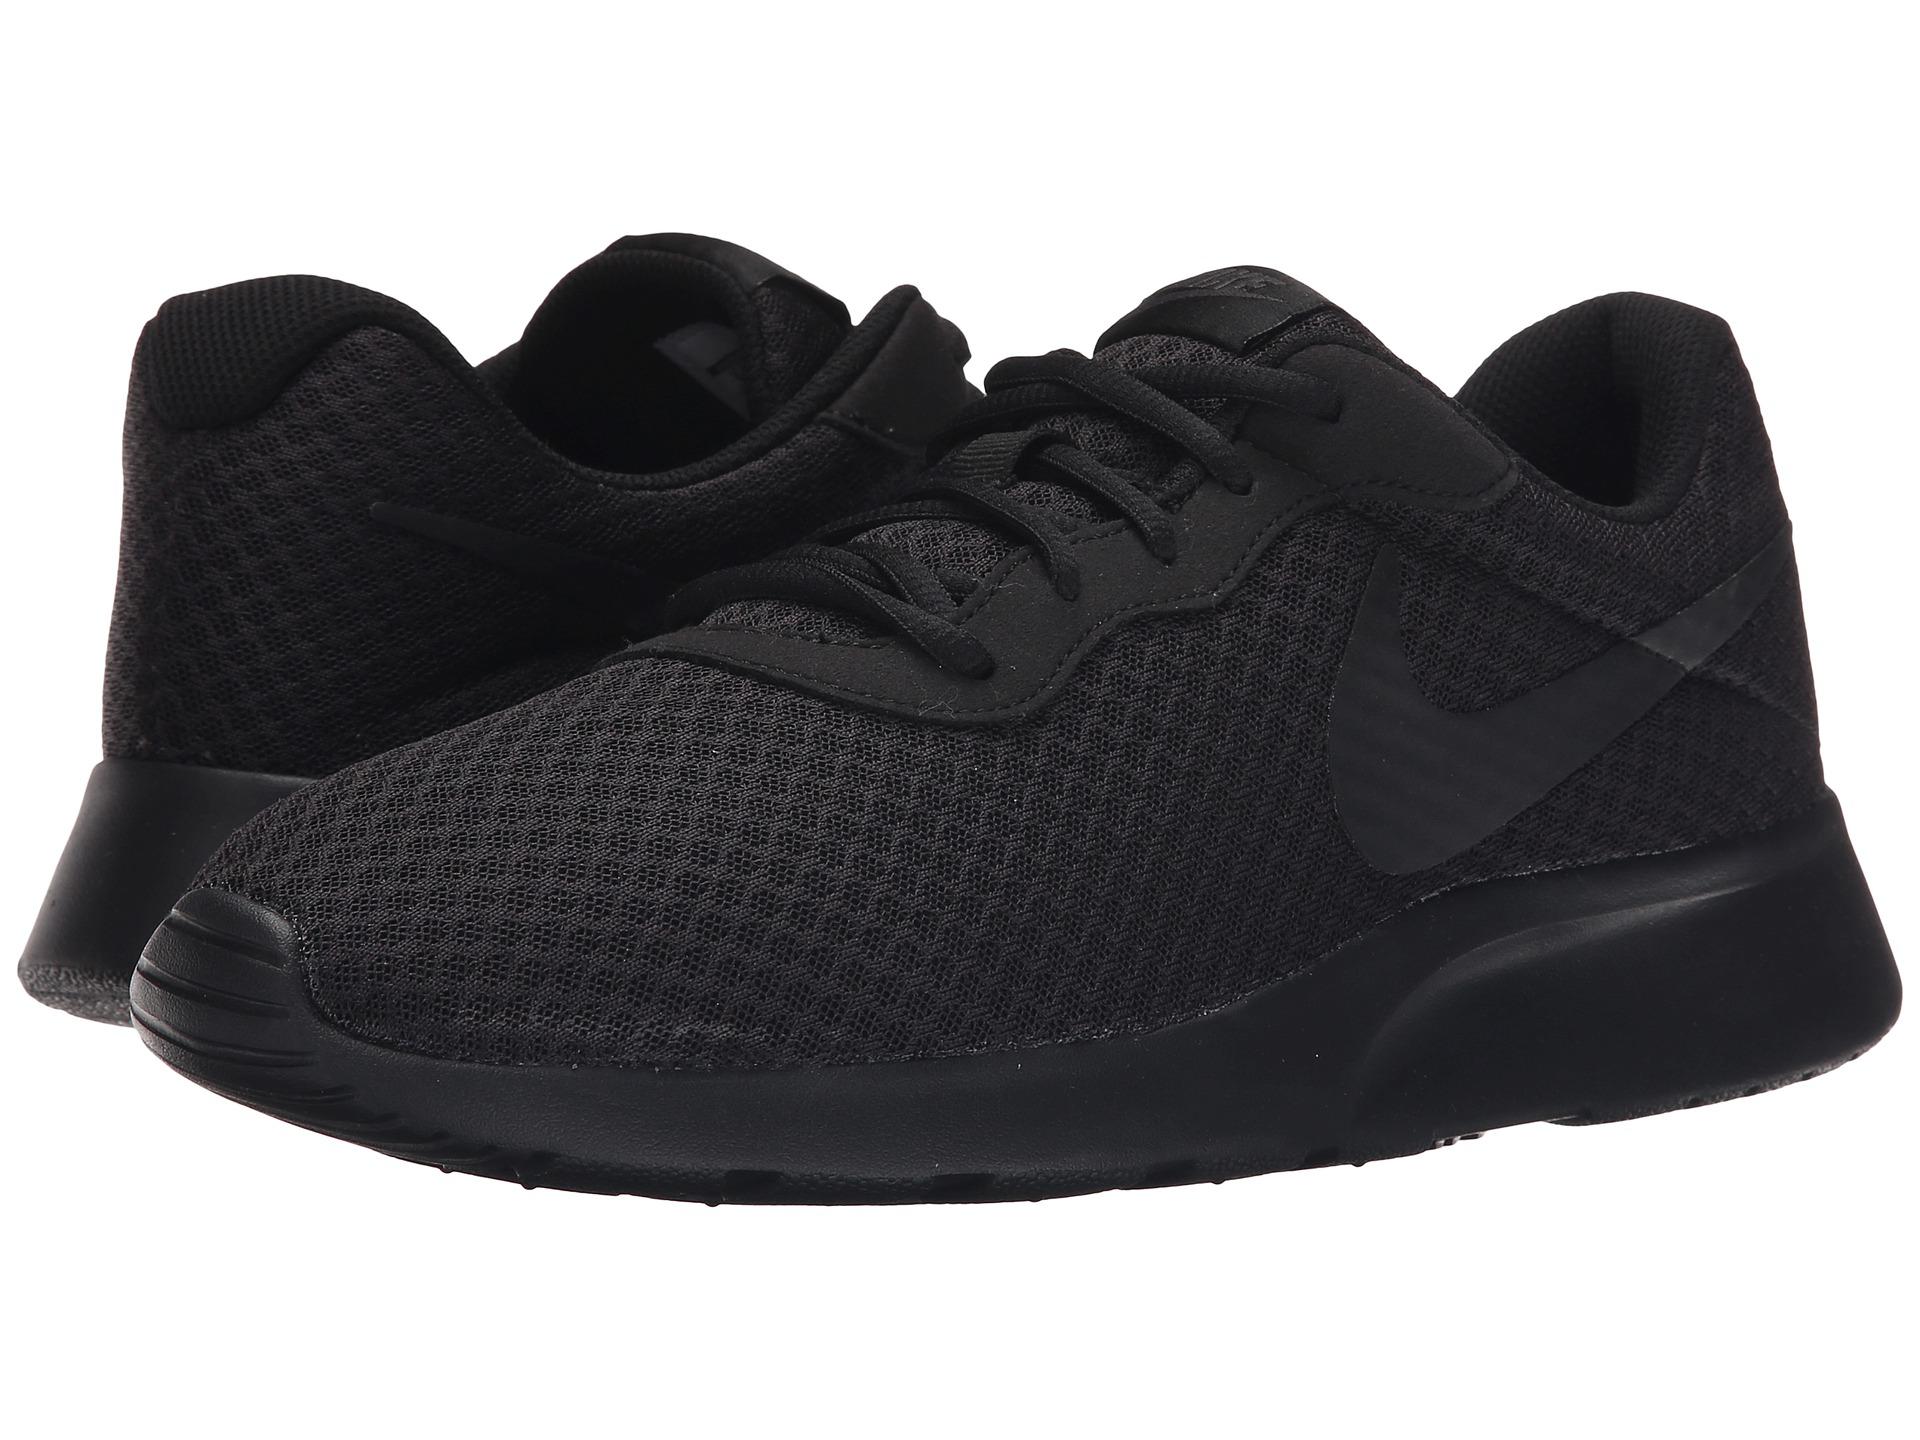 Nike Tanjun Women S Athletic Shoes On Sale